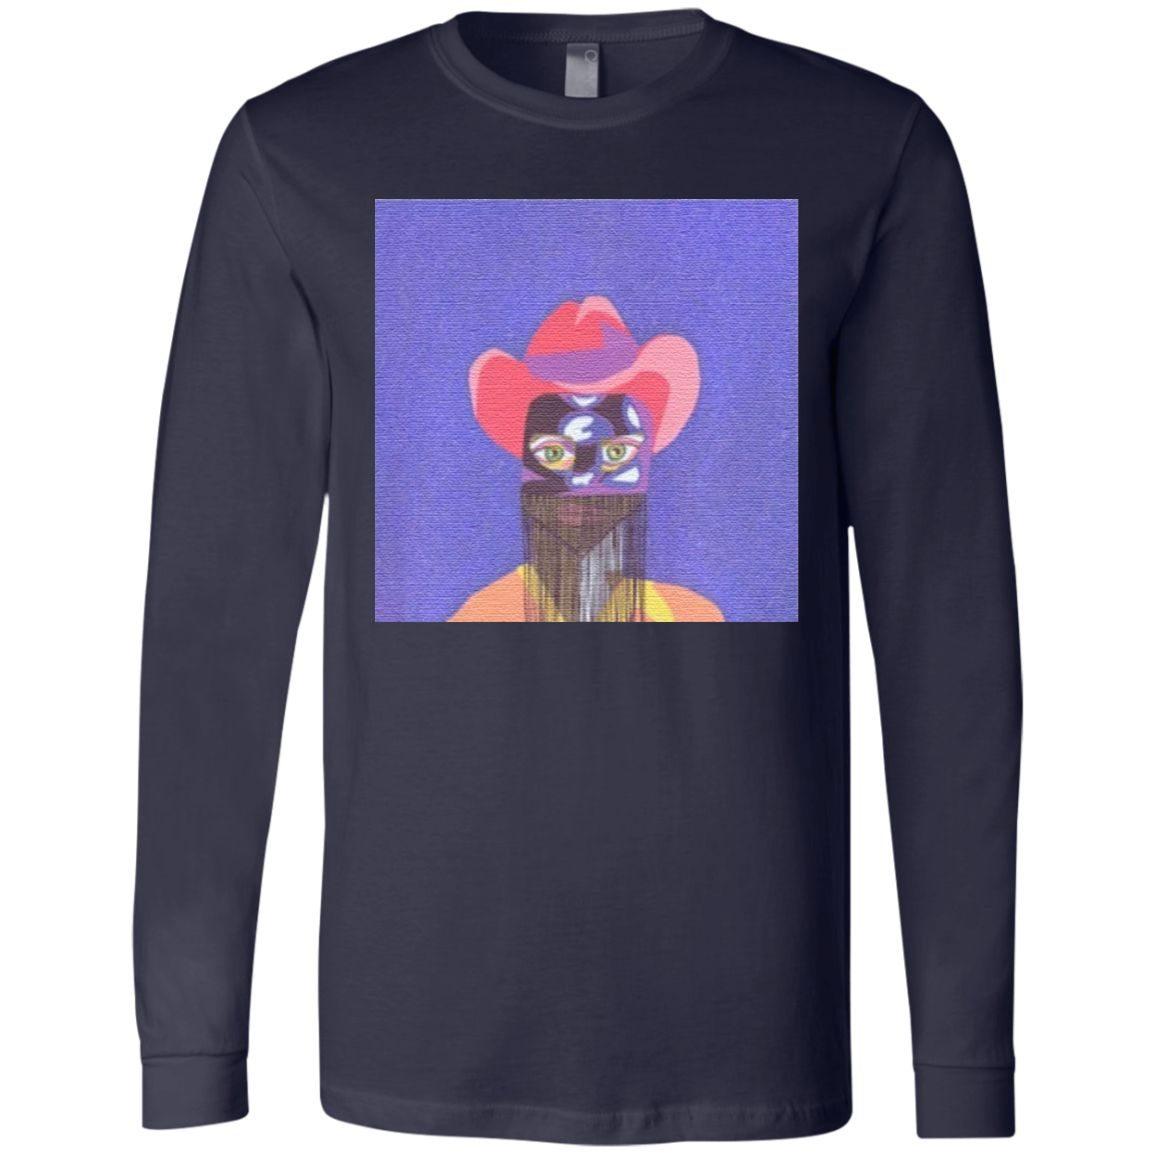 Orville peck t shirt